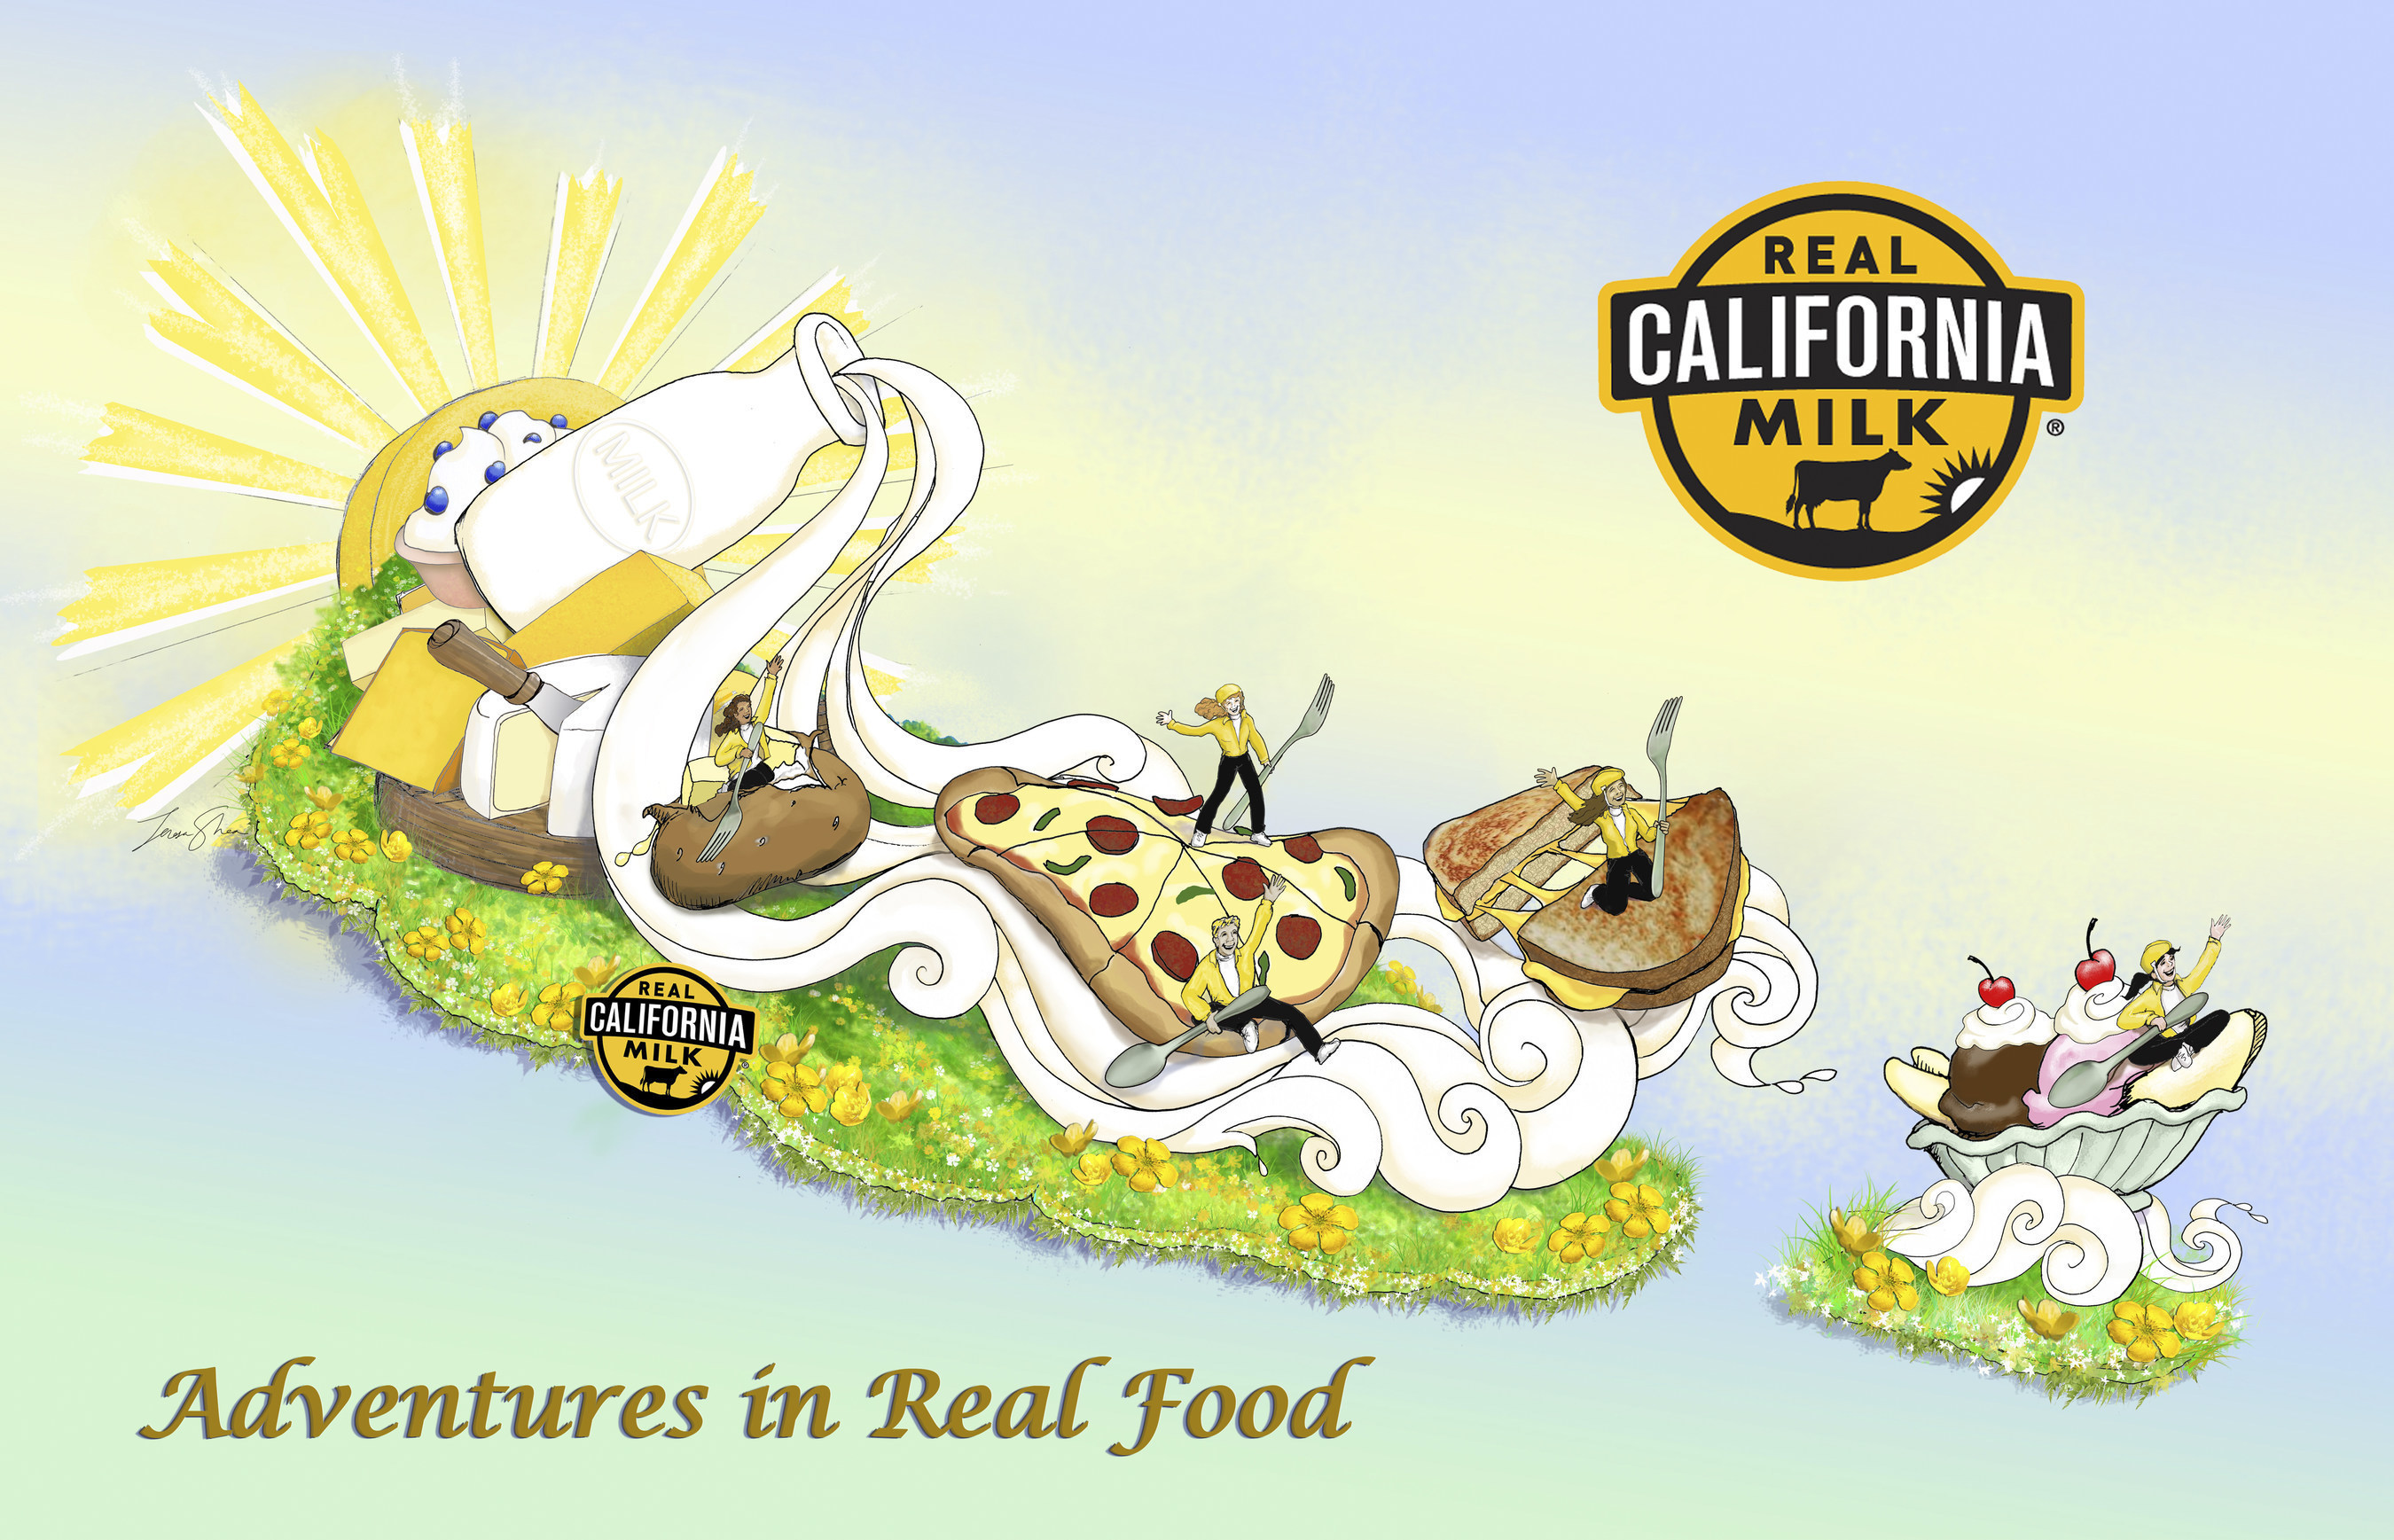 California Milk Advisory Board's Rose Parade(R) Float